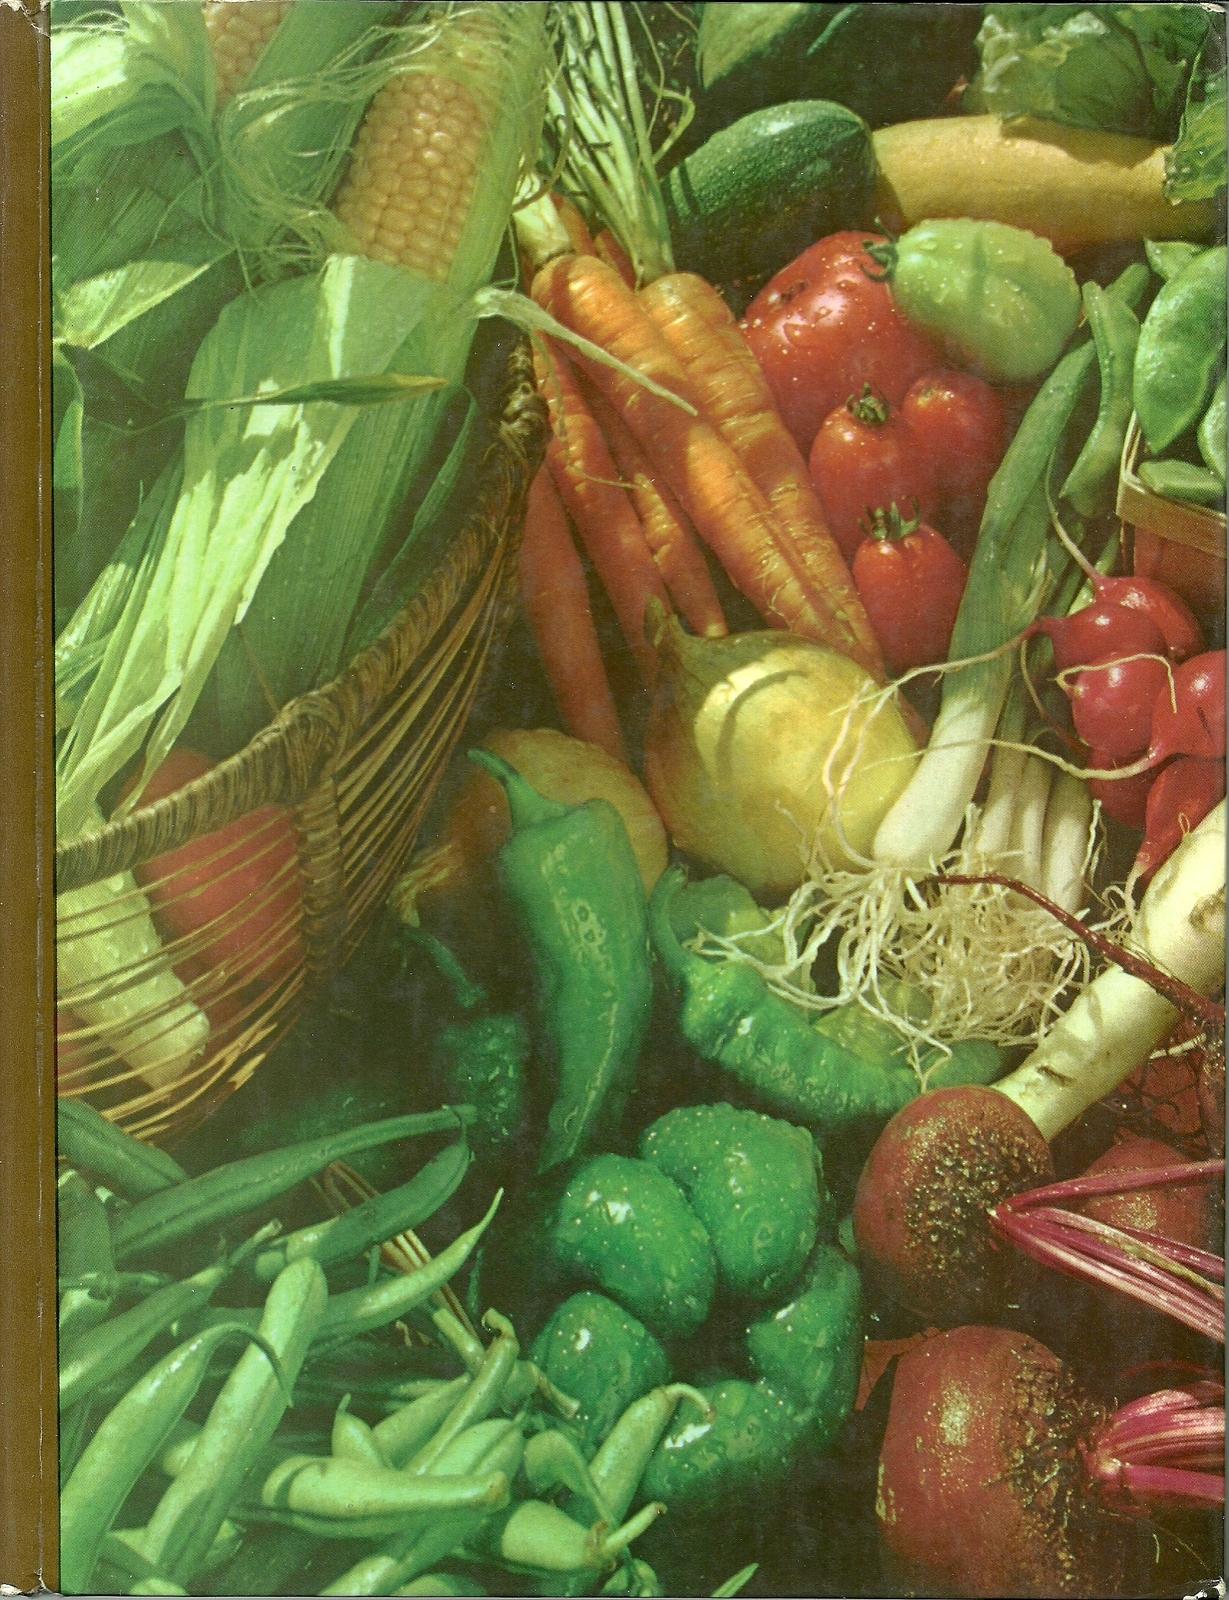 100 unusual garden vegetables the weird fruit and veg comin a guide cover letter for designing a vegetable garden write a cv pro altavistaventures Choice Image